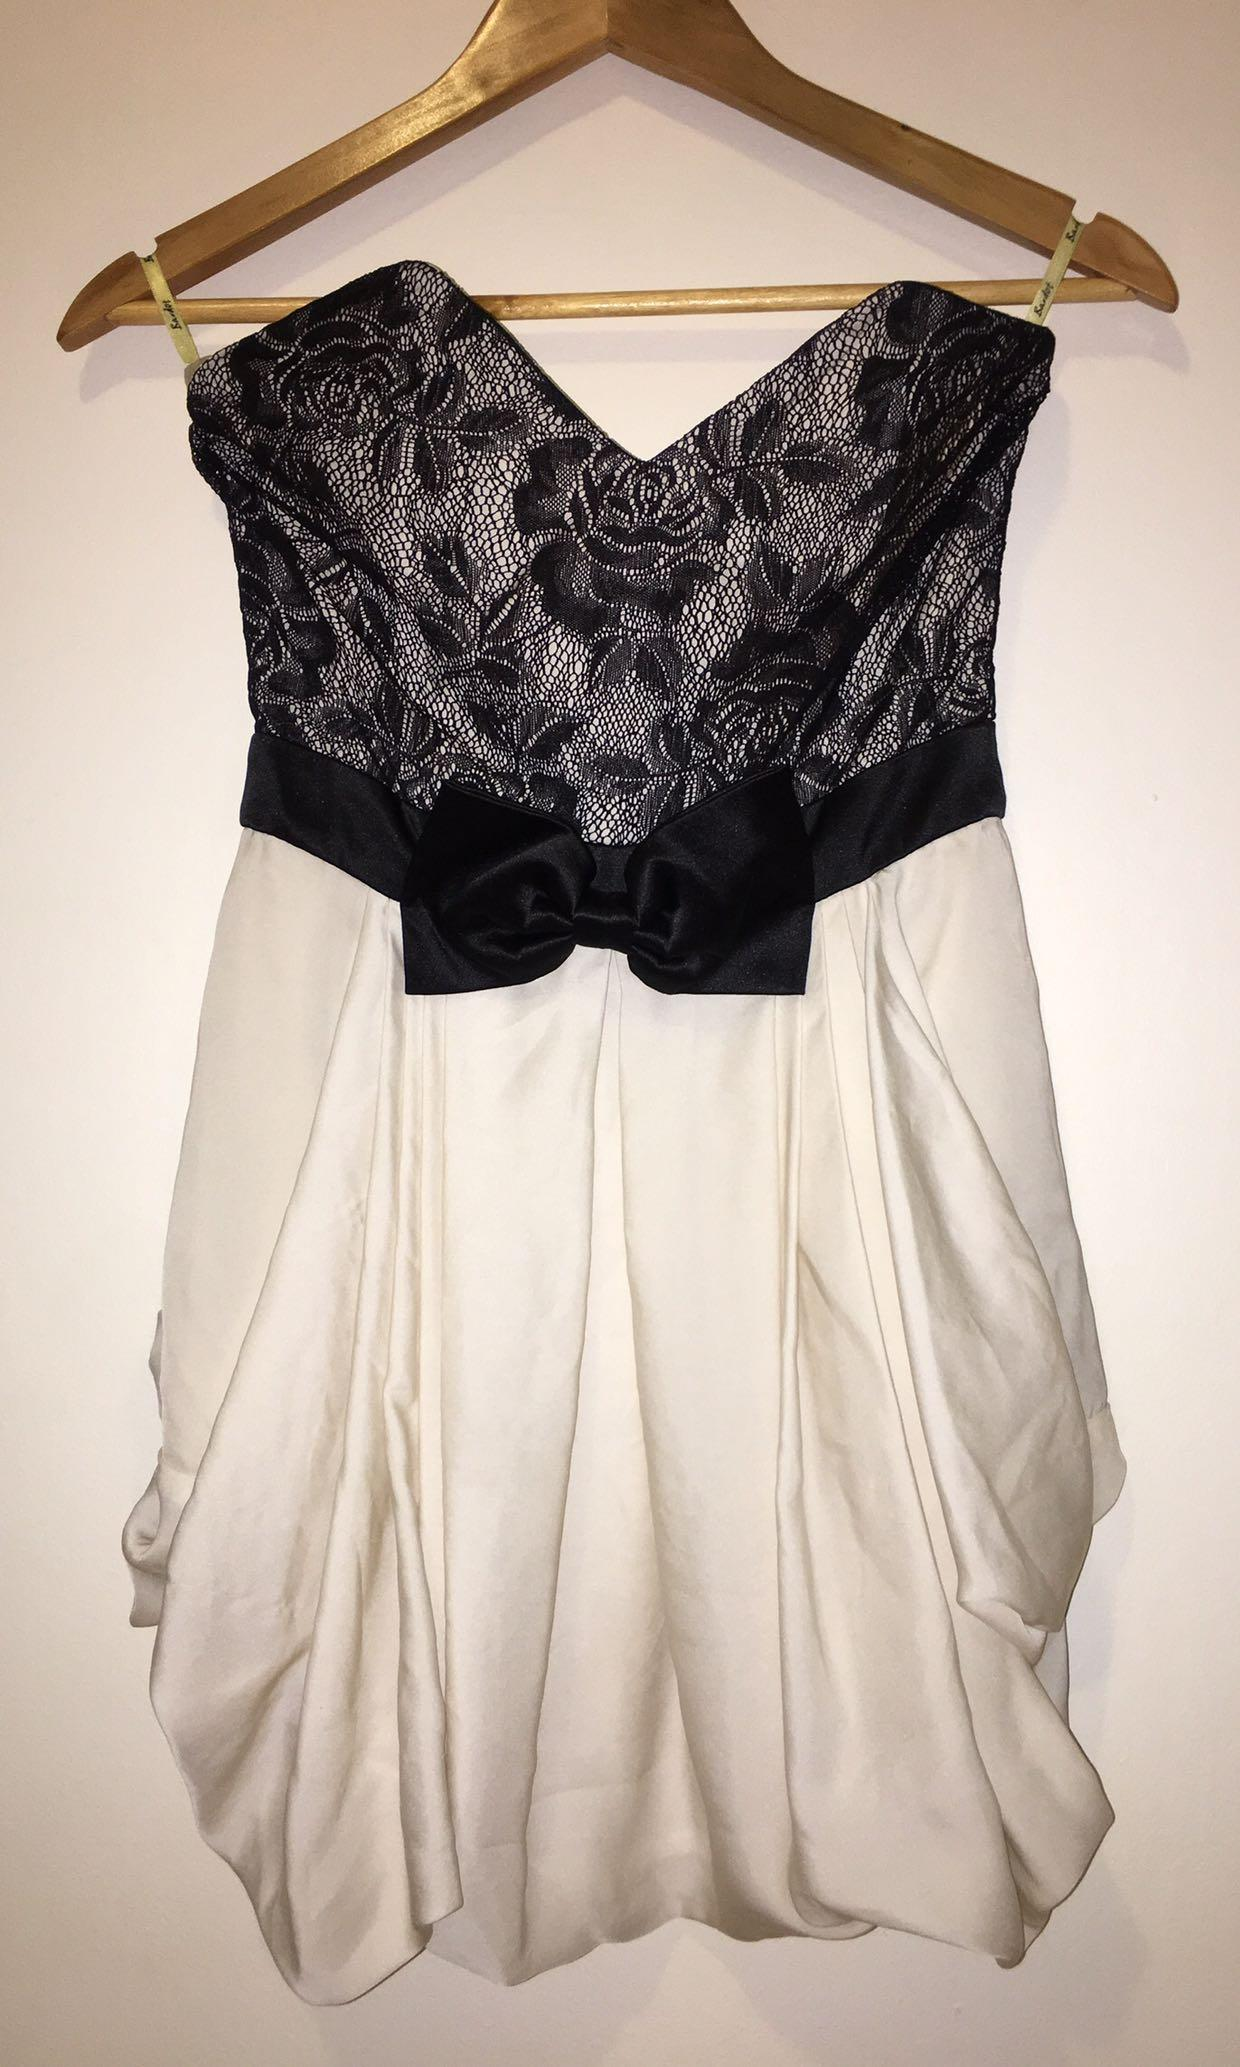 Bardot Dress Black & White Lace Floral Bow Strapless Ruffles